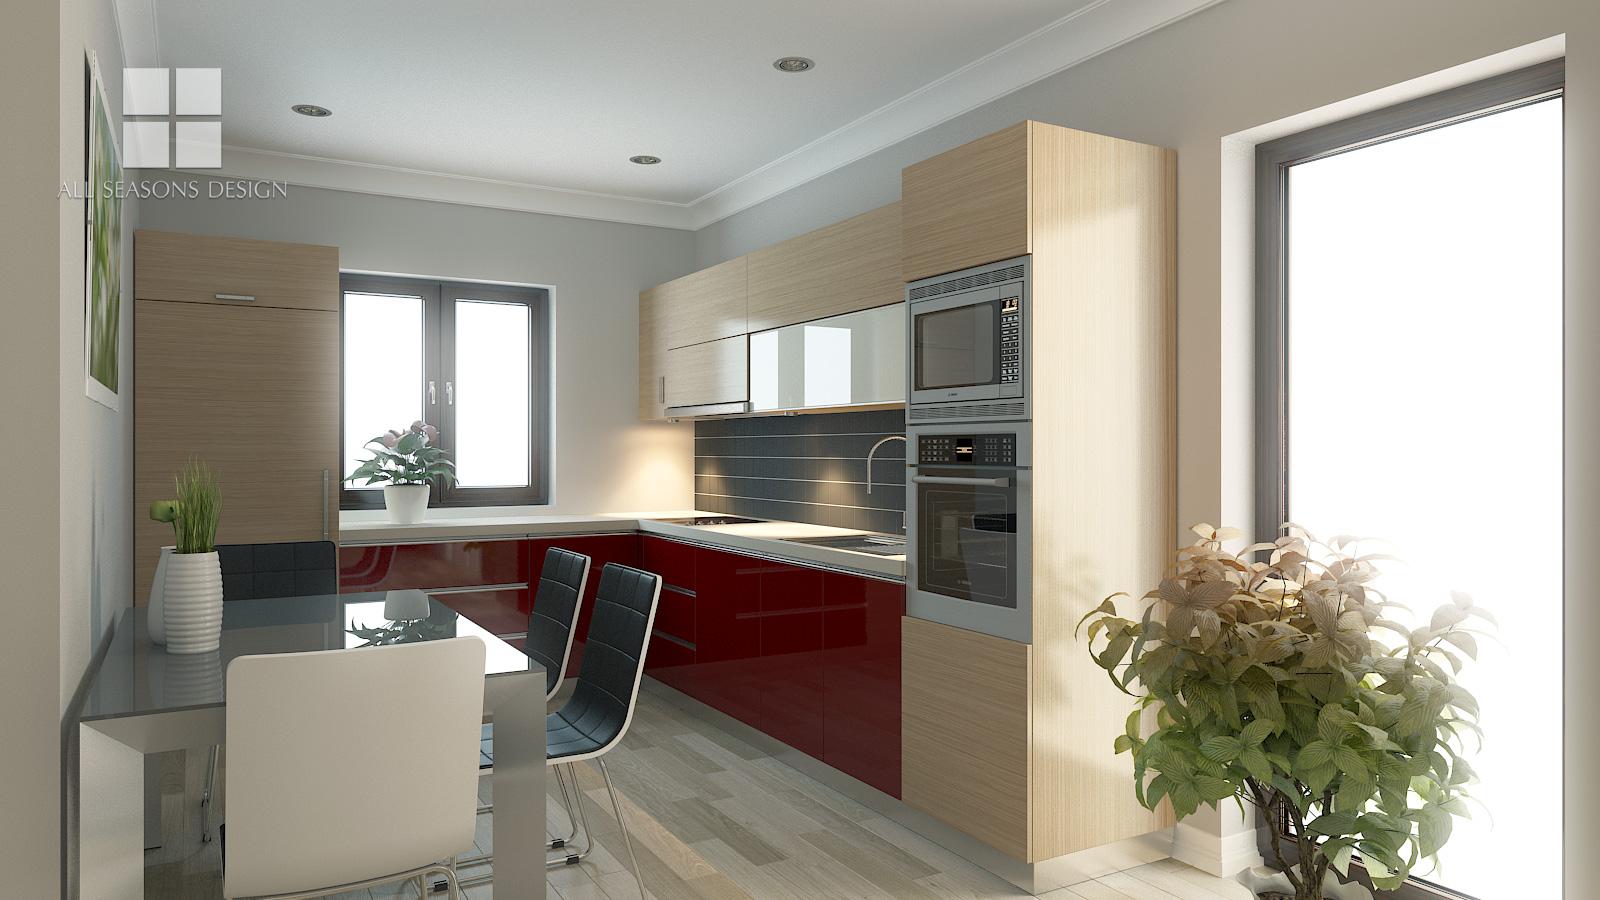 Amenajare bucatarie locuinta domnesti all seasons design for Proiect casa 2 camere living baie si bucatarie